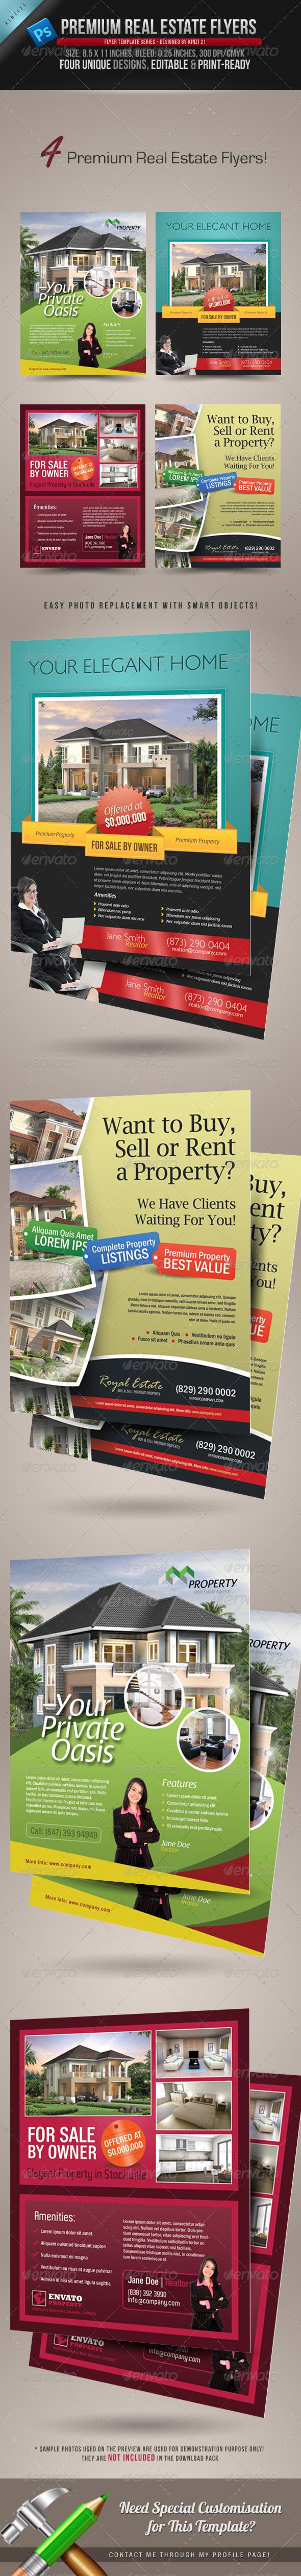 GraphicRiver Premium Real Estate Flyers 1267214